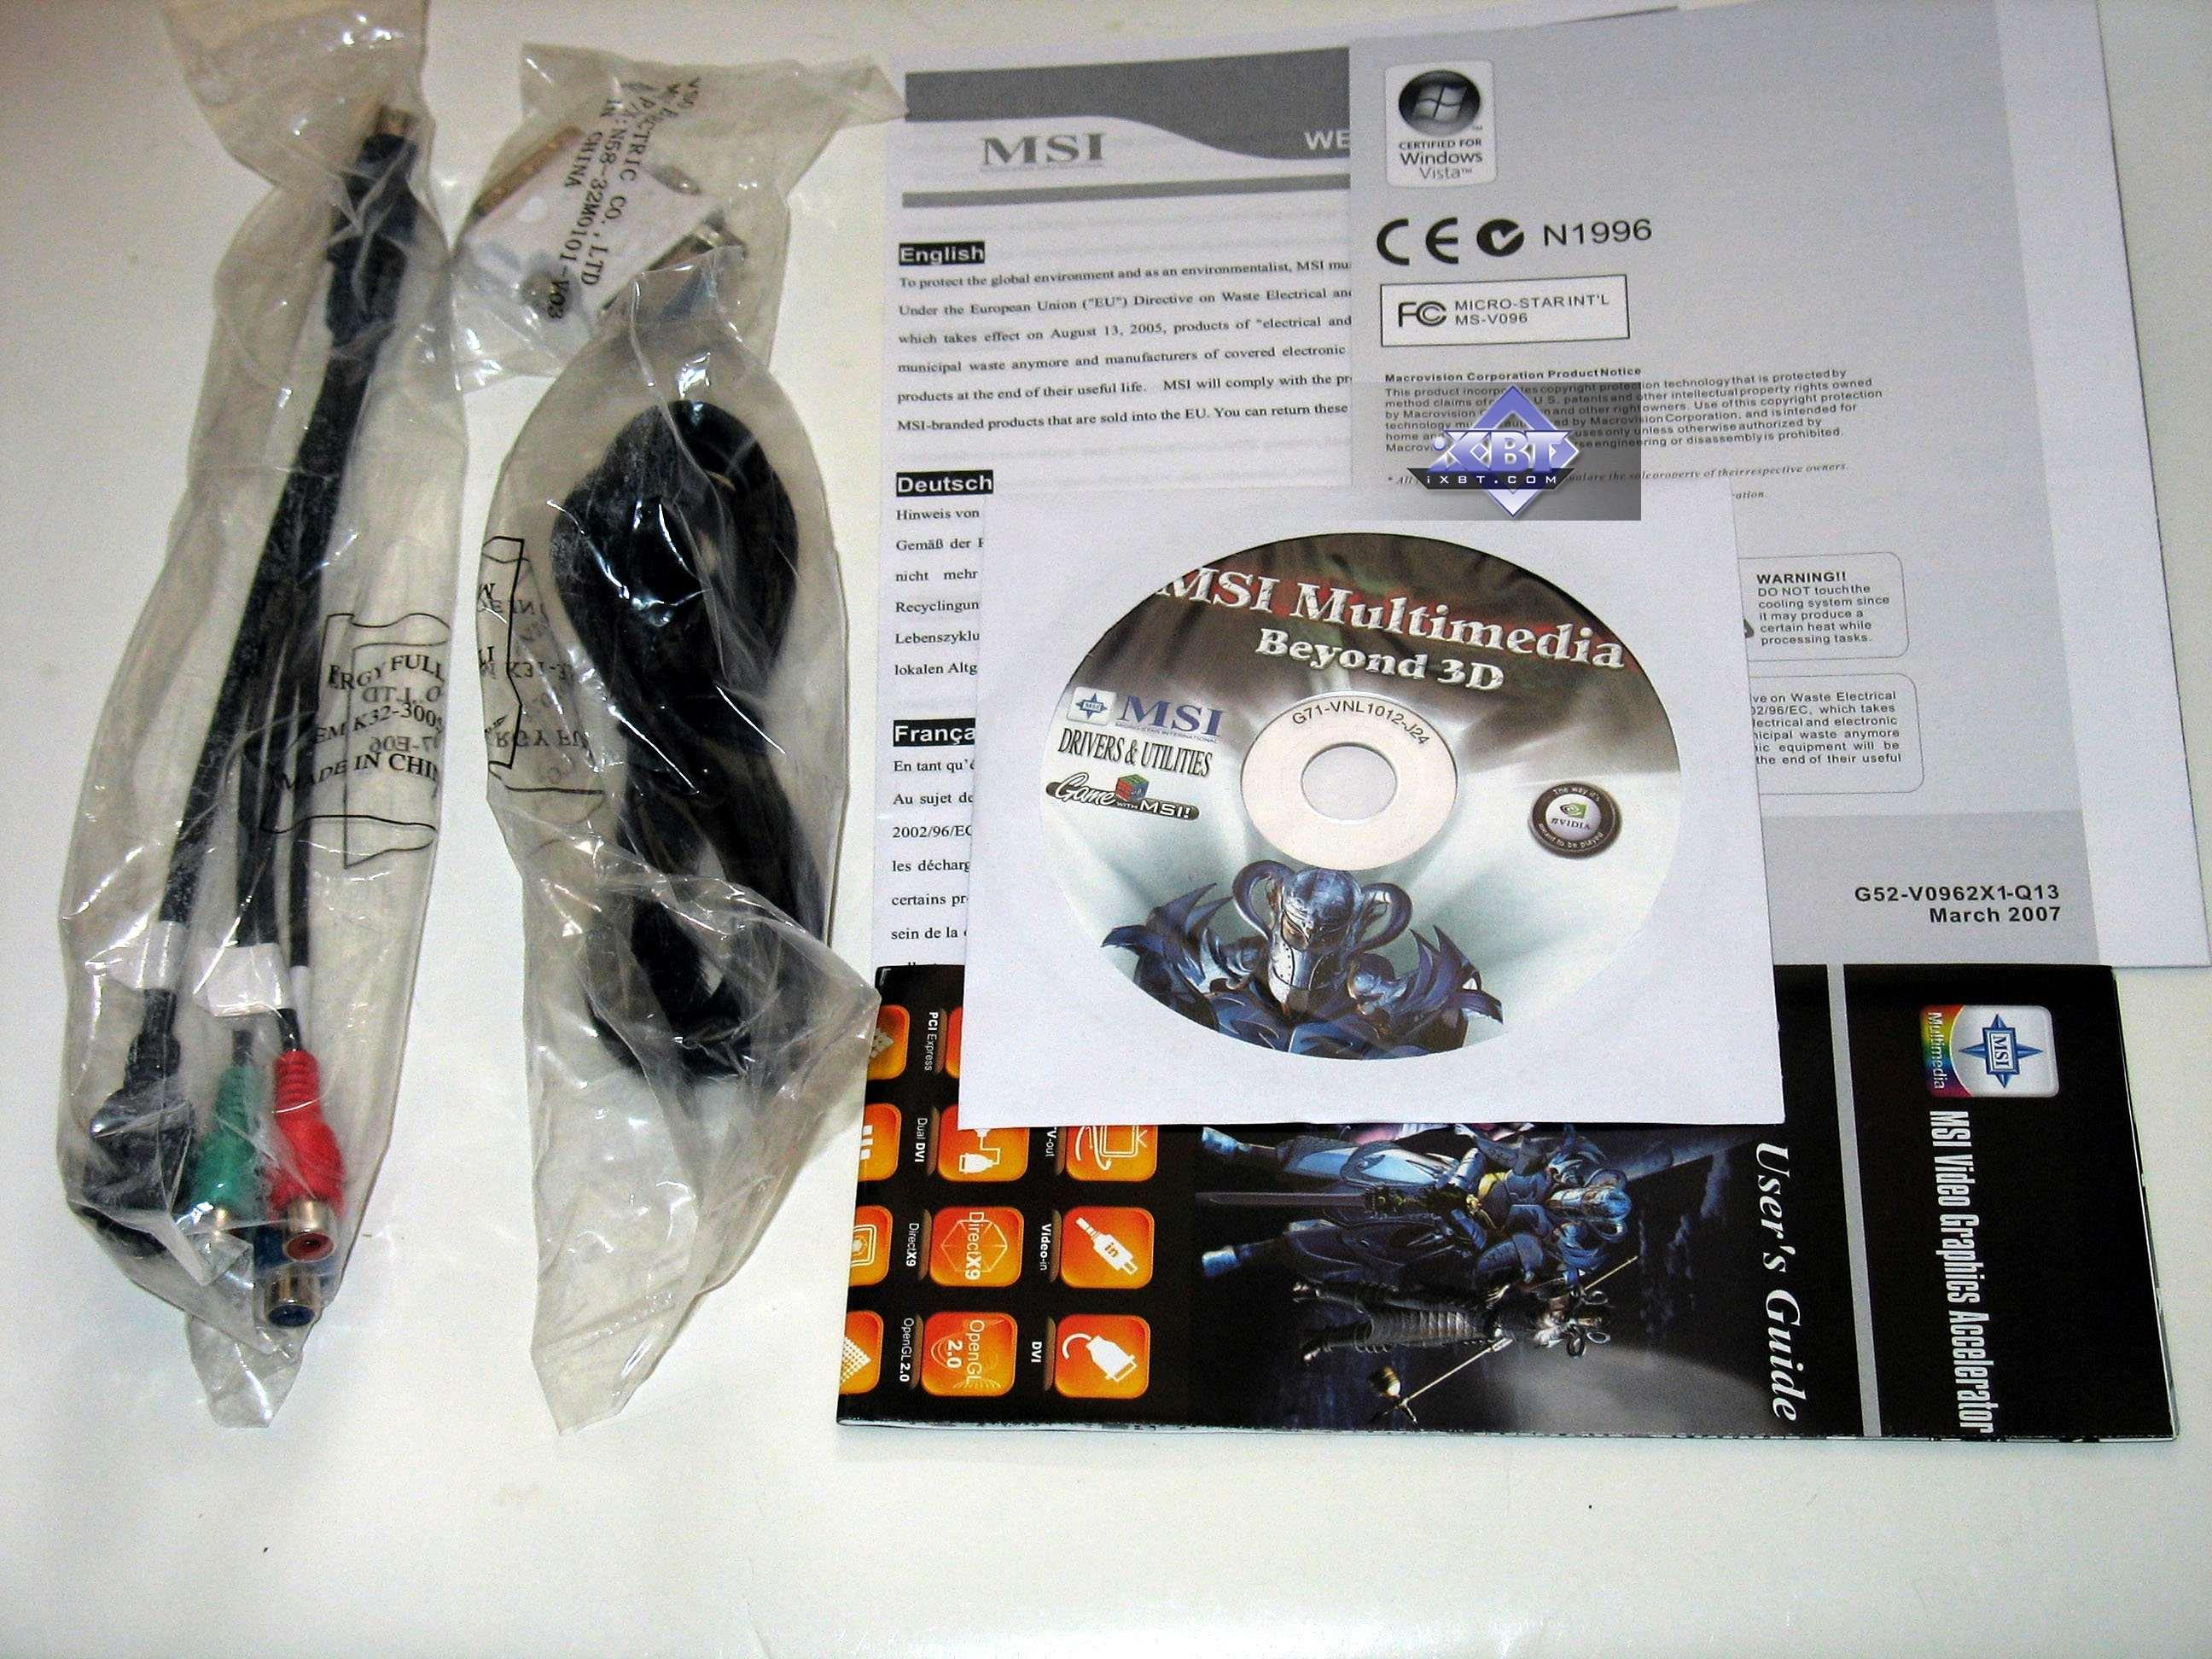 Geforce 8600 xp sp2 driver